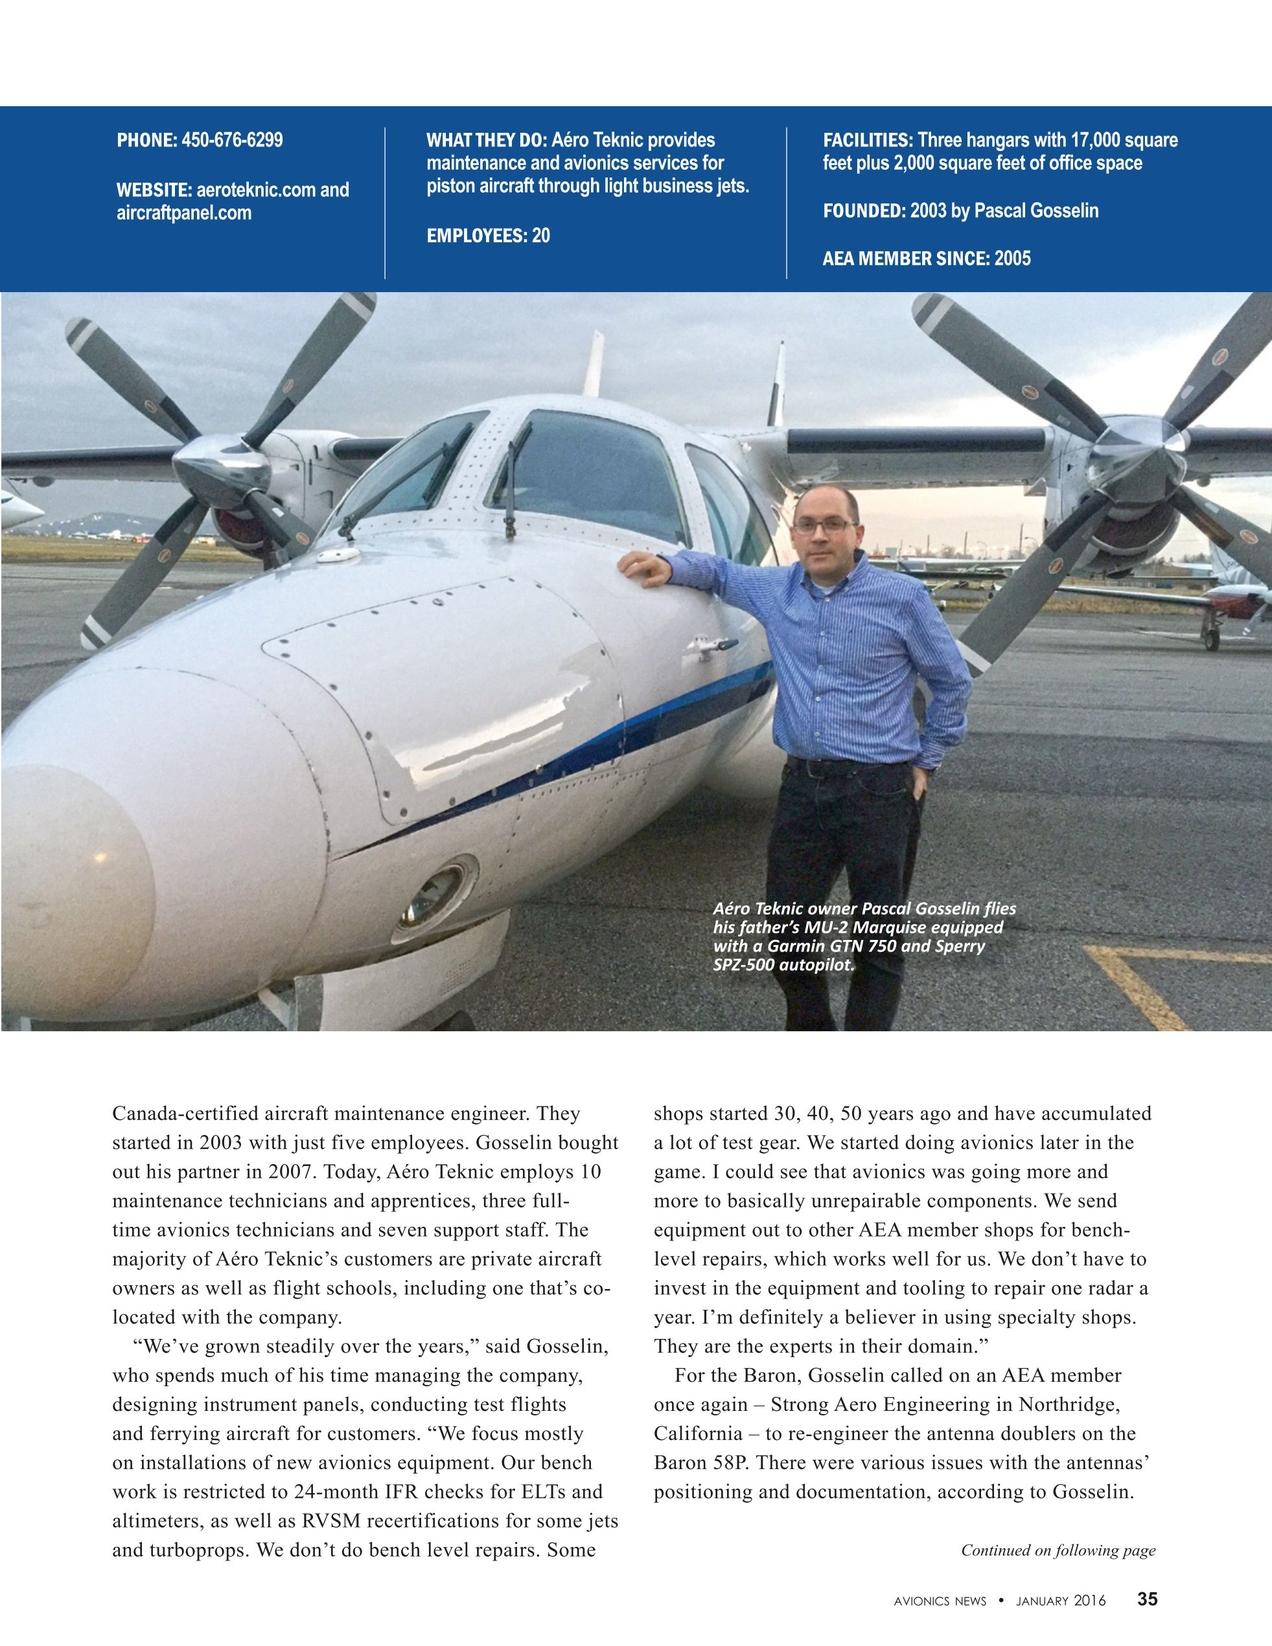 Avionics News January 2016